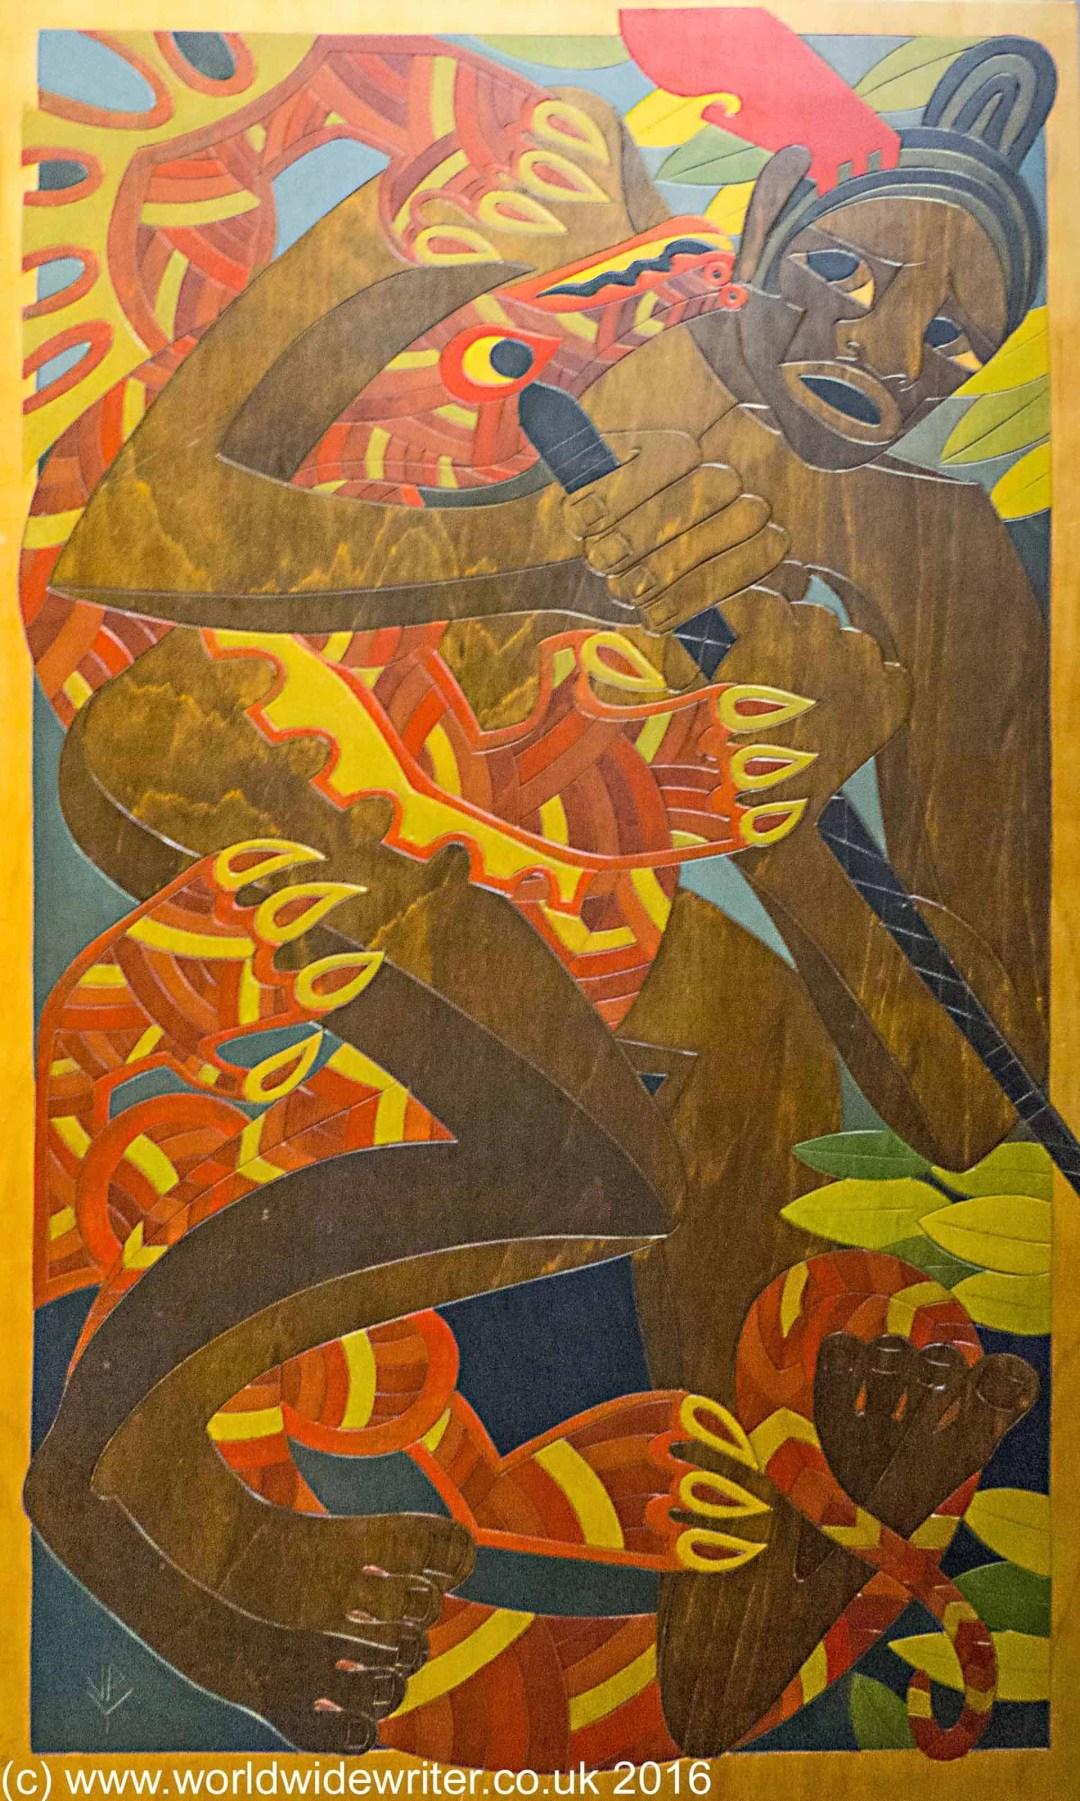 Maori art in the Russell Museum - www.worldwidewriter.co.uk